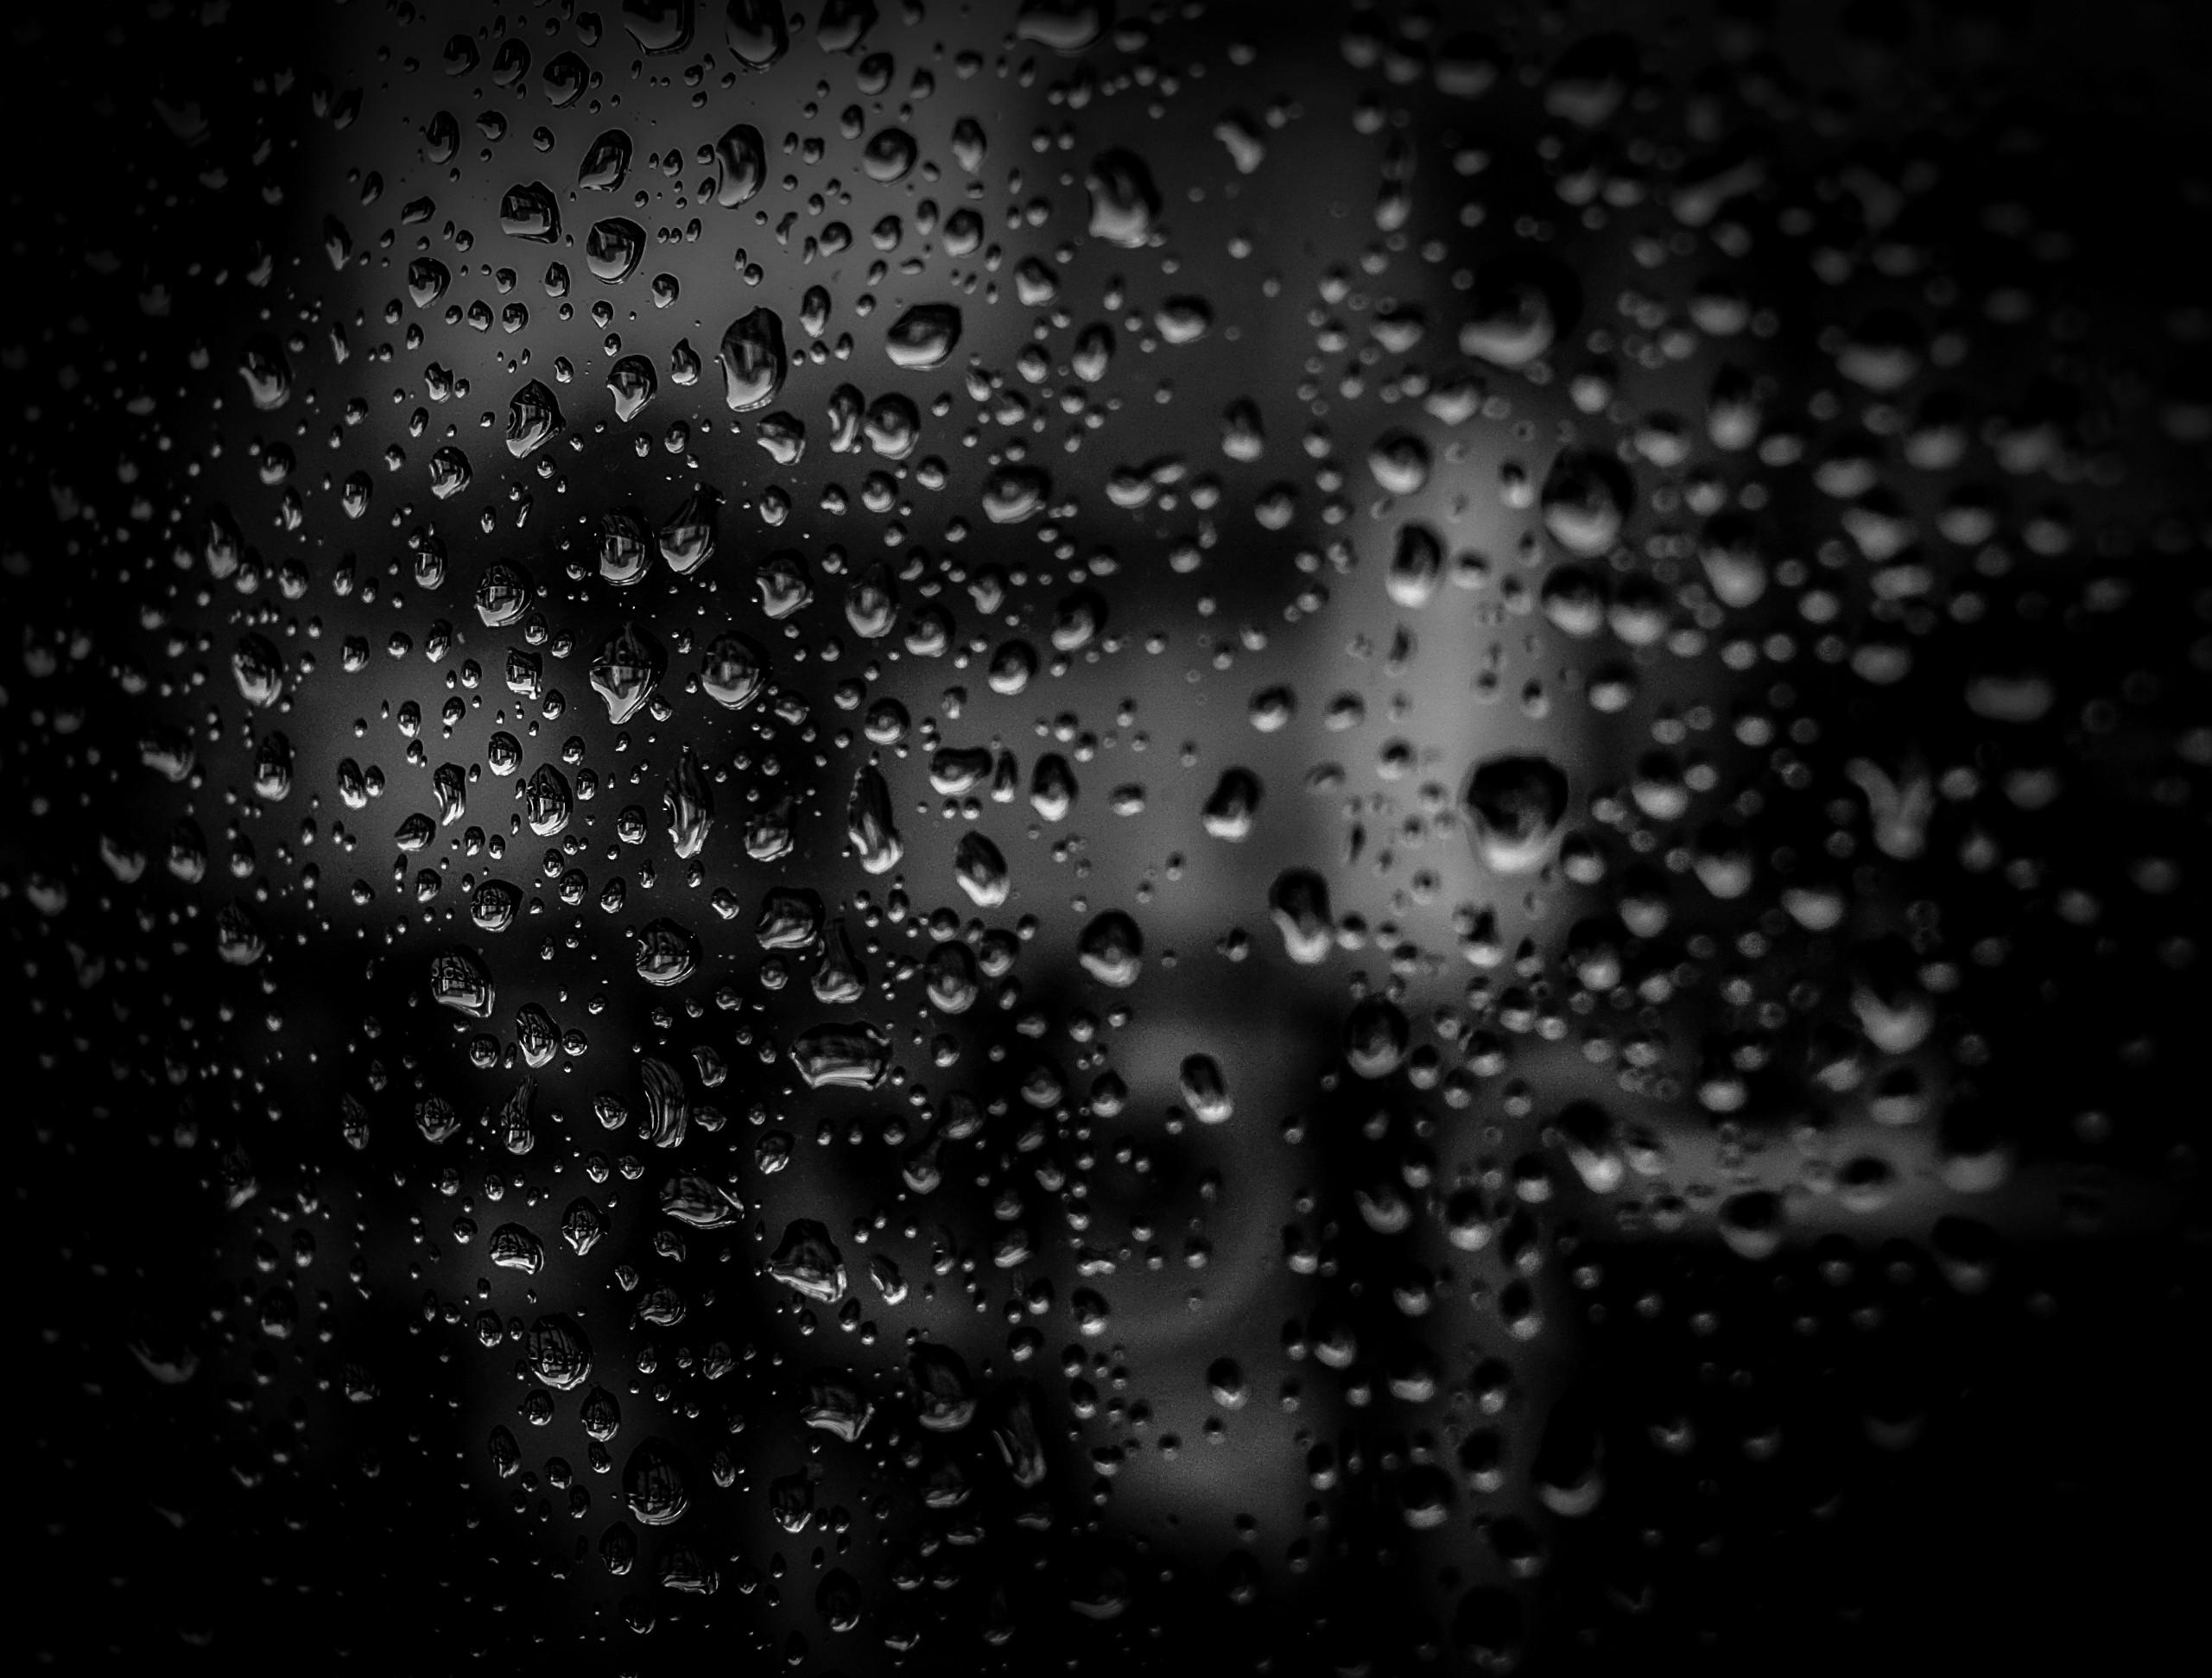 Free stock photo of water, dark, glass, dew